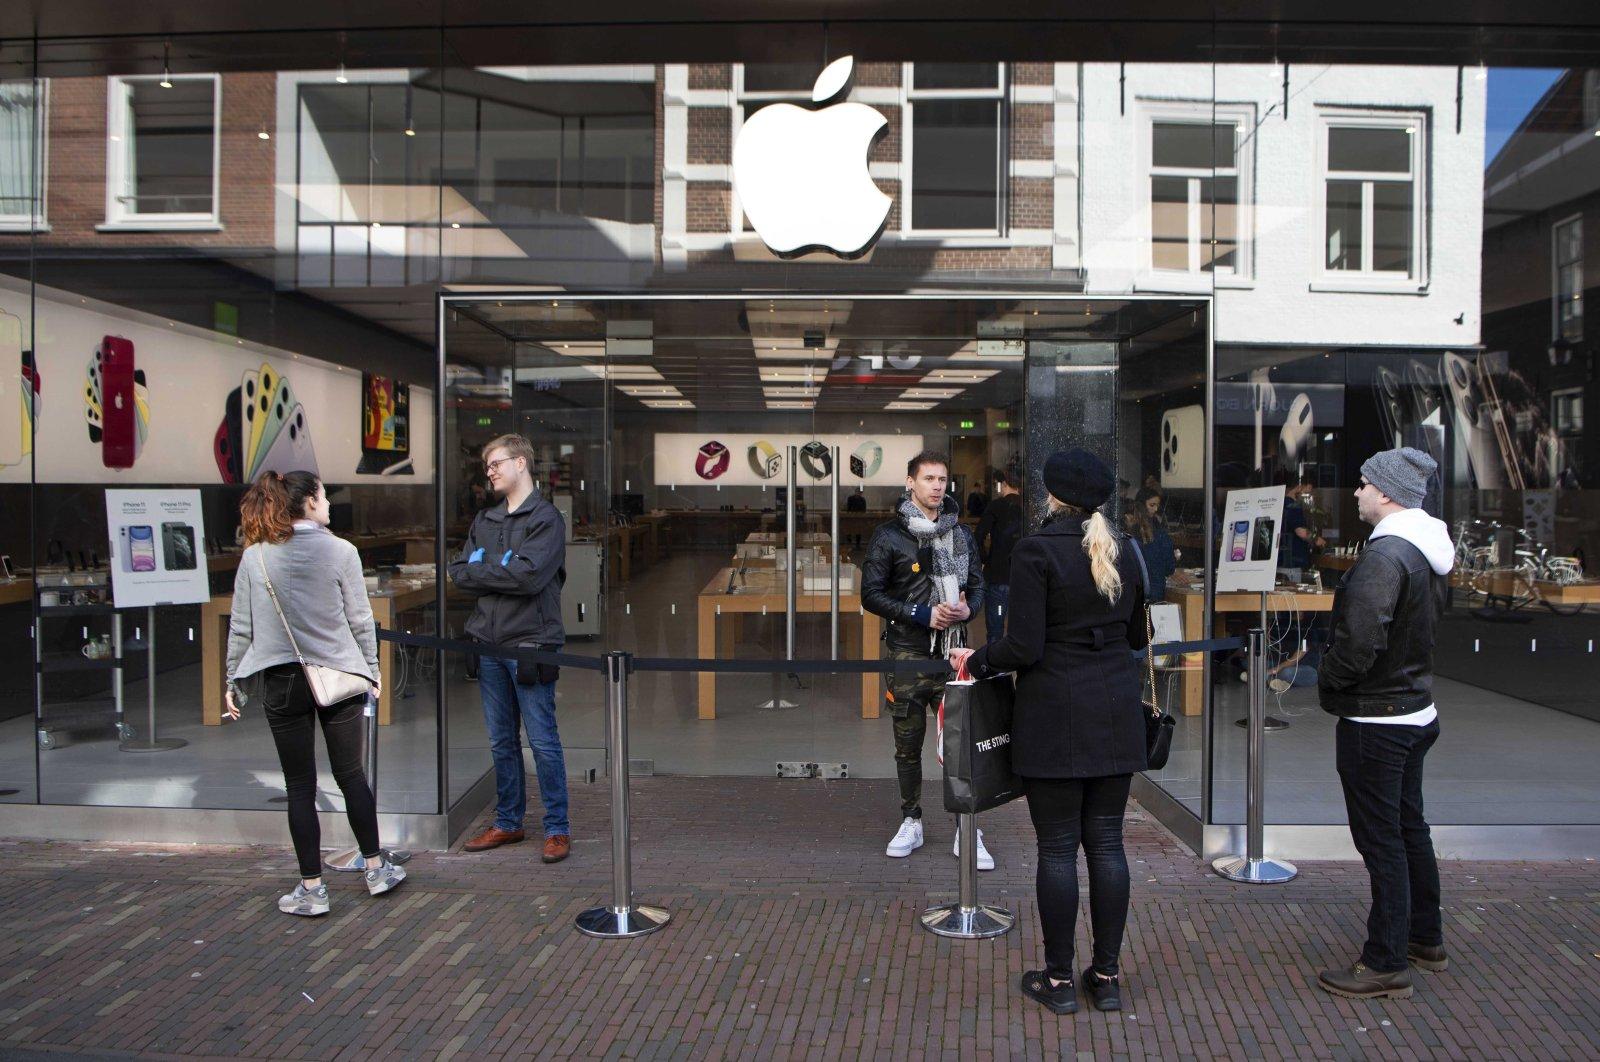 Apple Store in Grote Houtstraat in Haarlem, Netherlands, March 14, 2020. (EPA Photo)